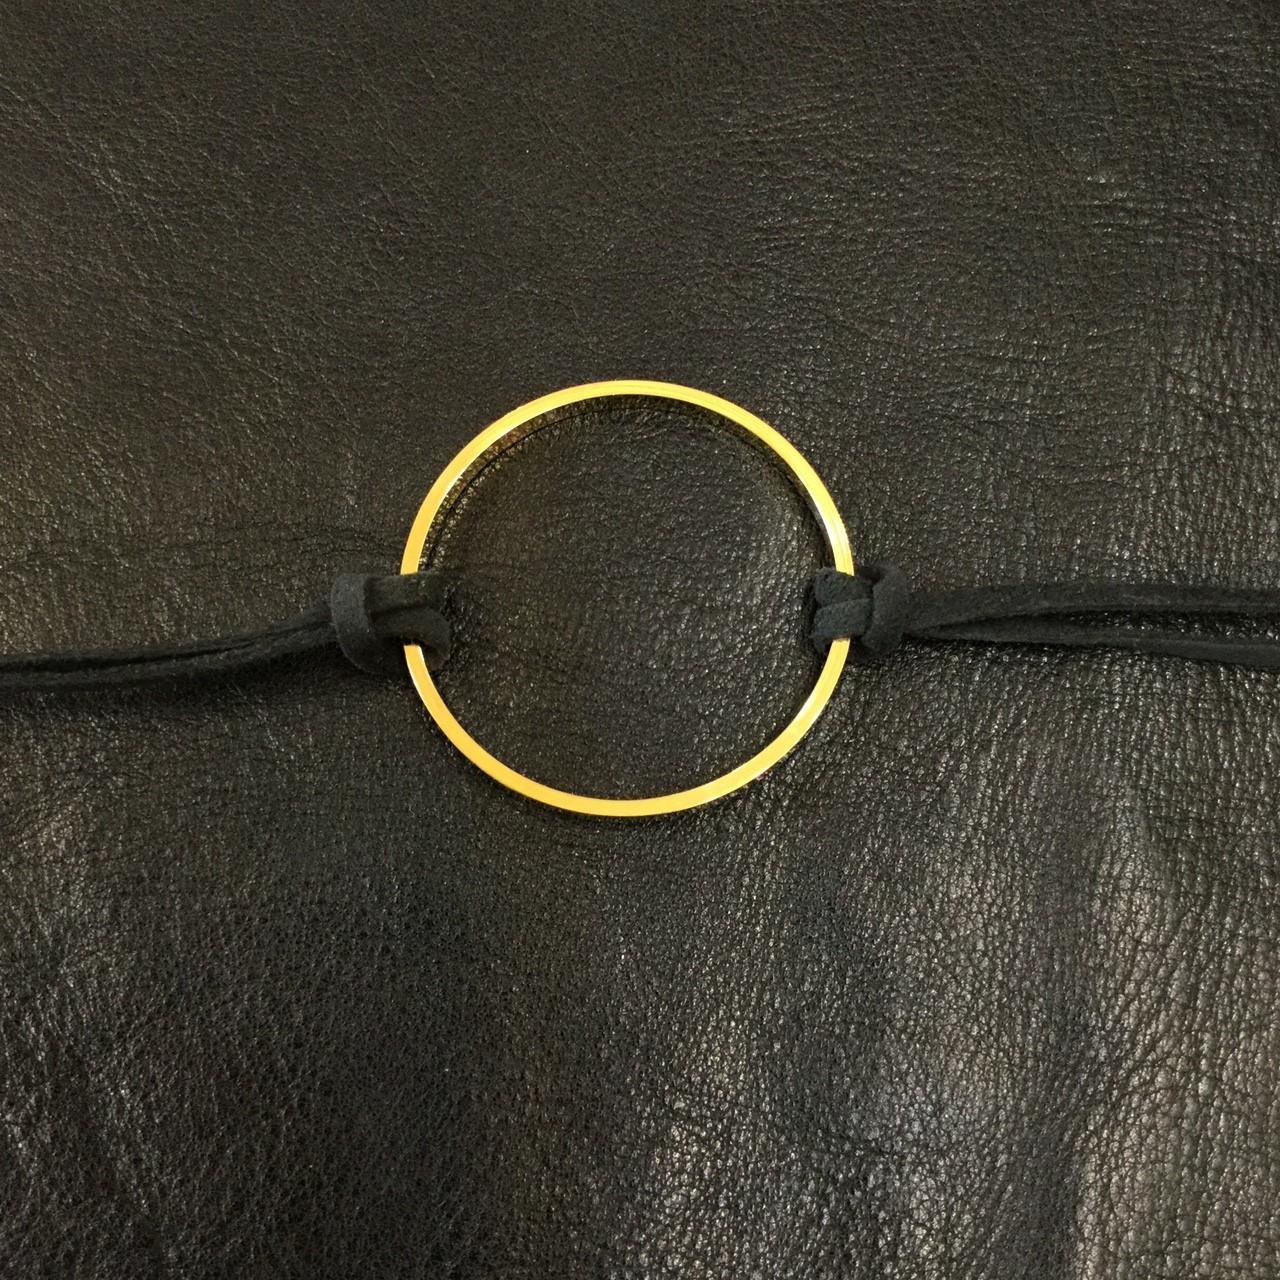 JGAC-065 LEATHER CORD CHOKER - CIRCLE(gold)